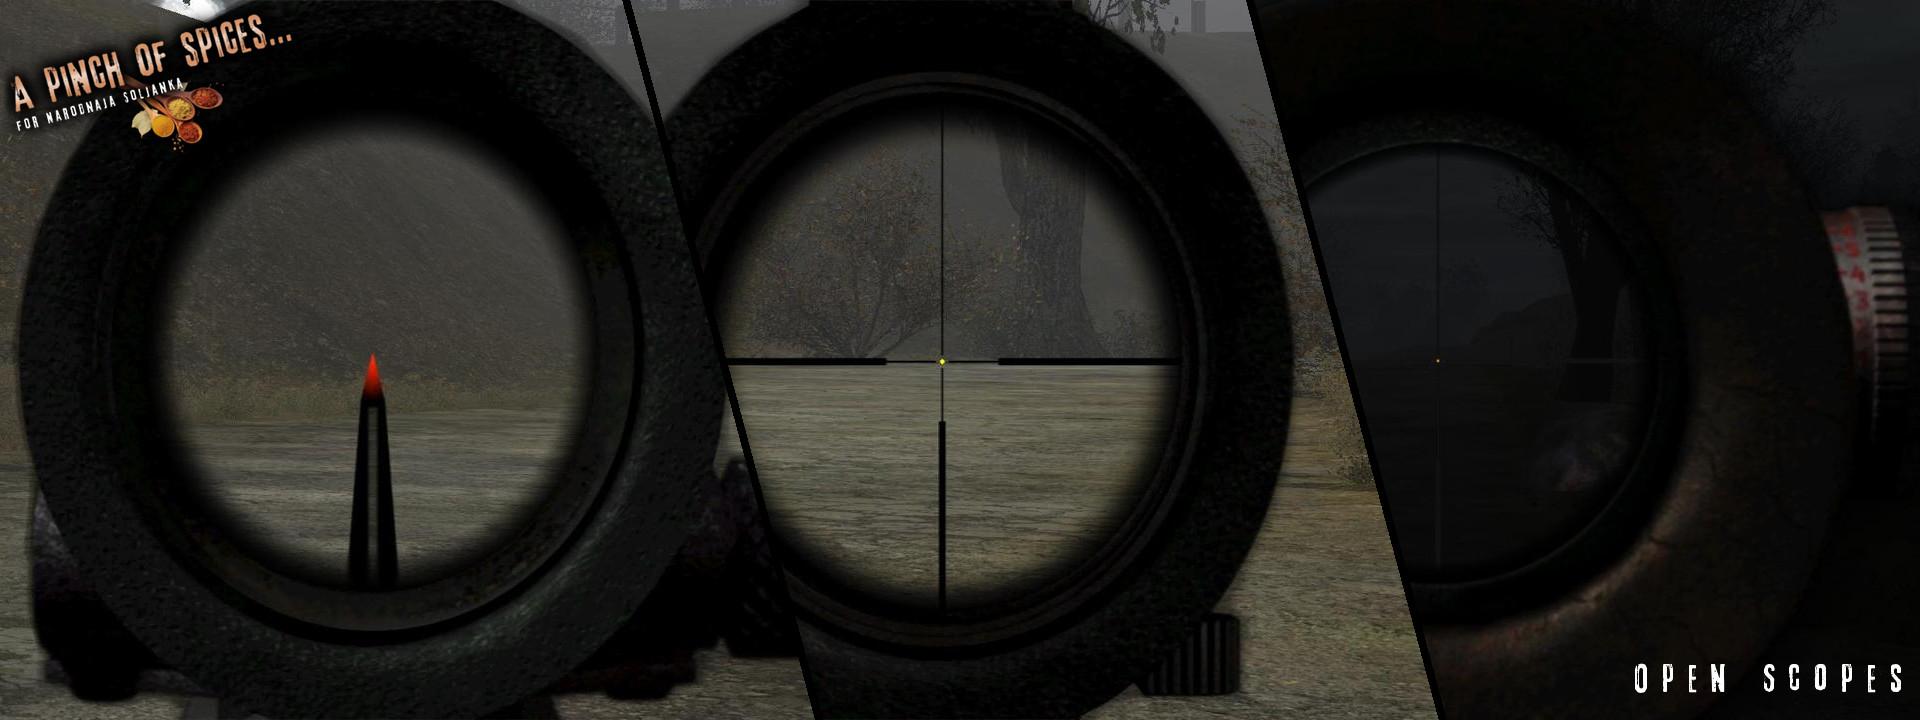 open scopes prev